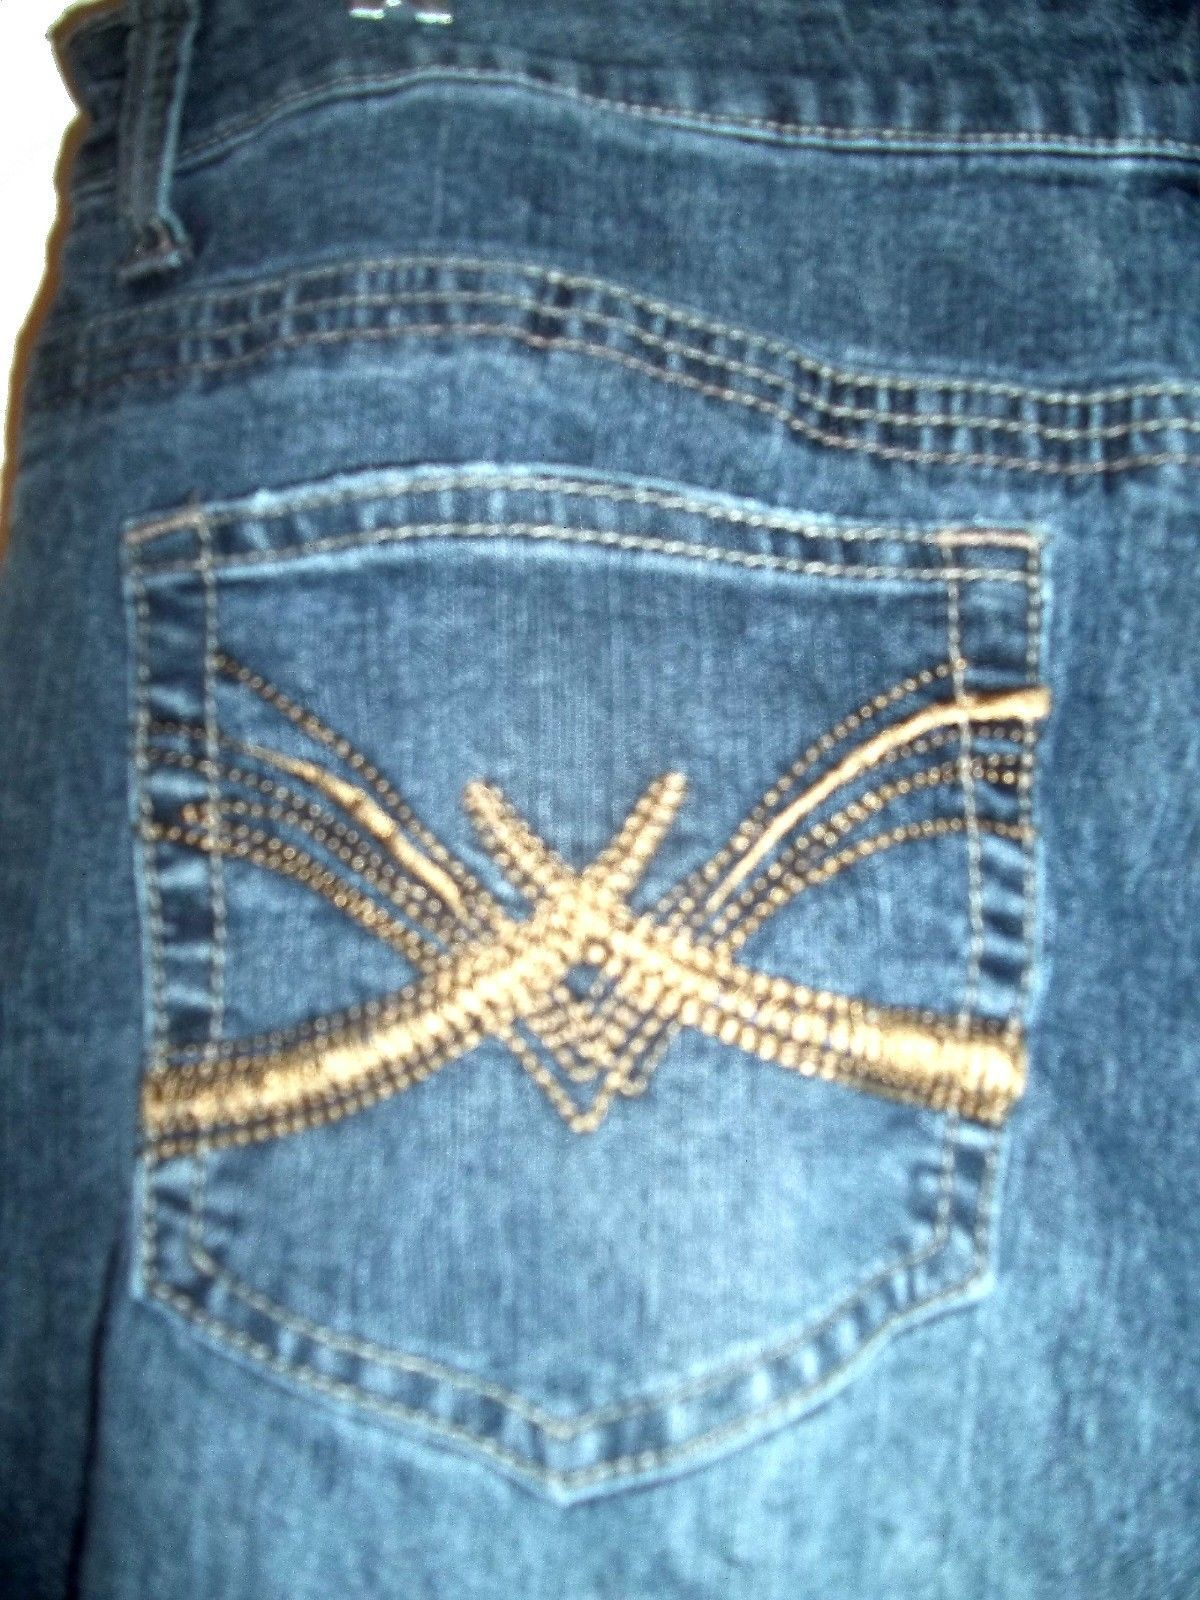 Sonoma Dark Blue Jean Denim Stretch Jeans with Embroidered Pockets Sz 14